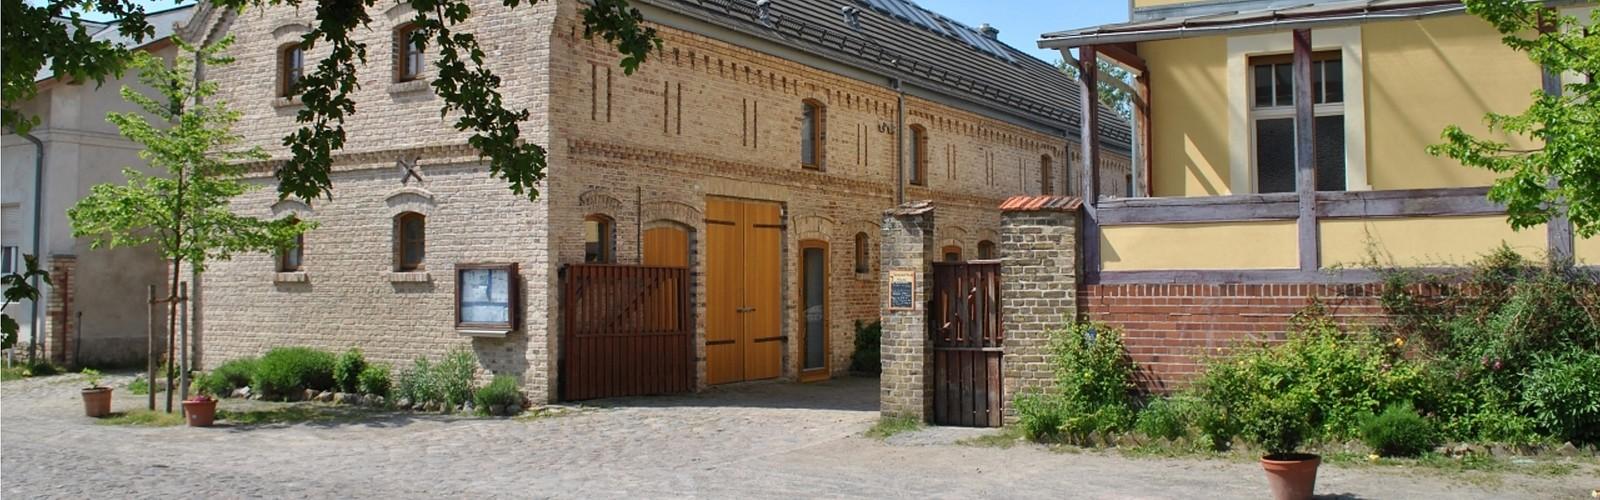 Street view of the Storchenhof, photo: Storchenhof Paretz